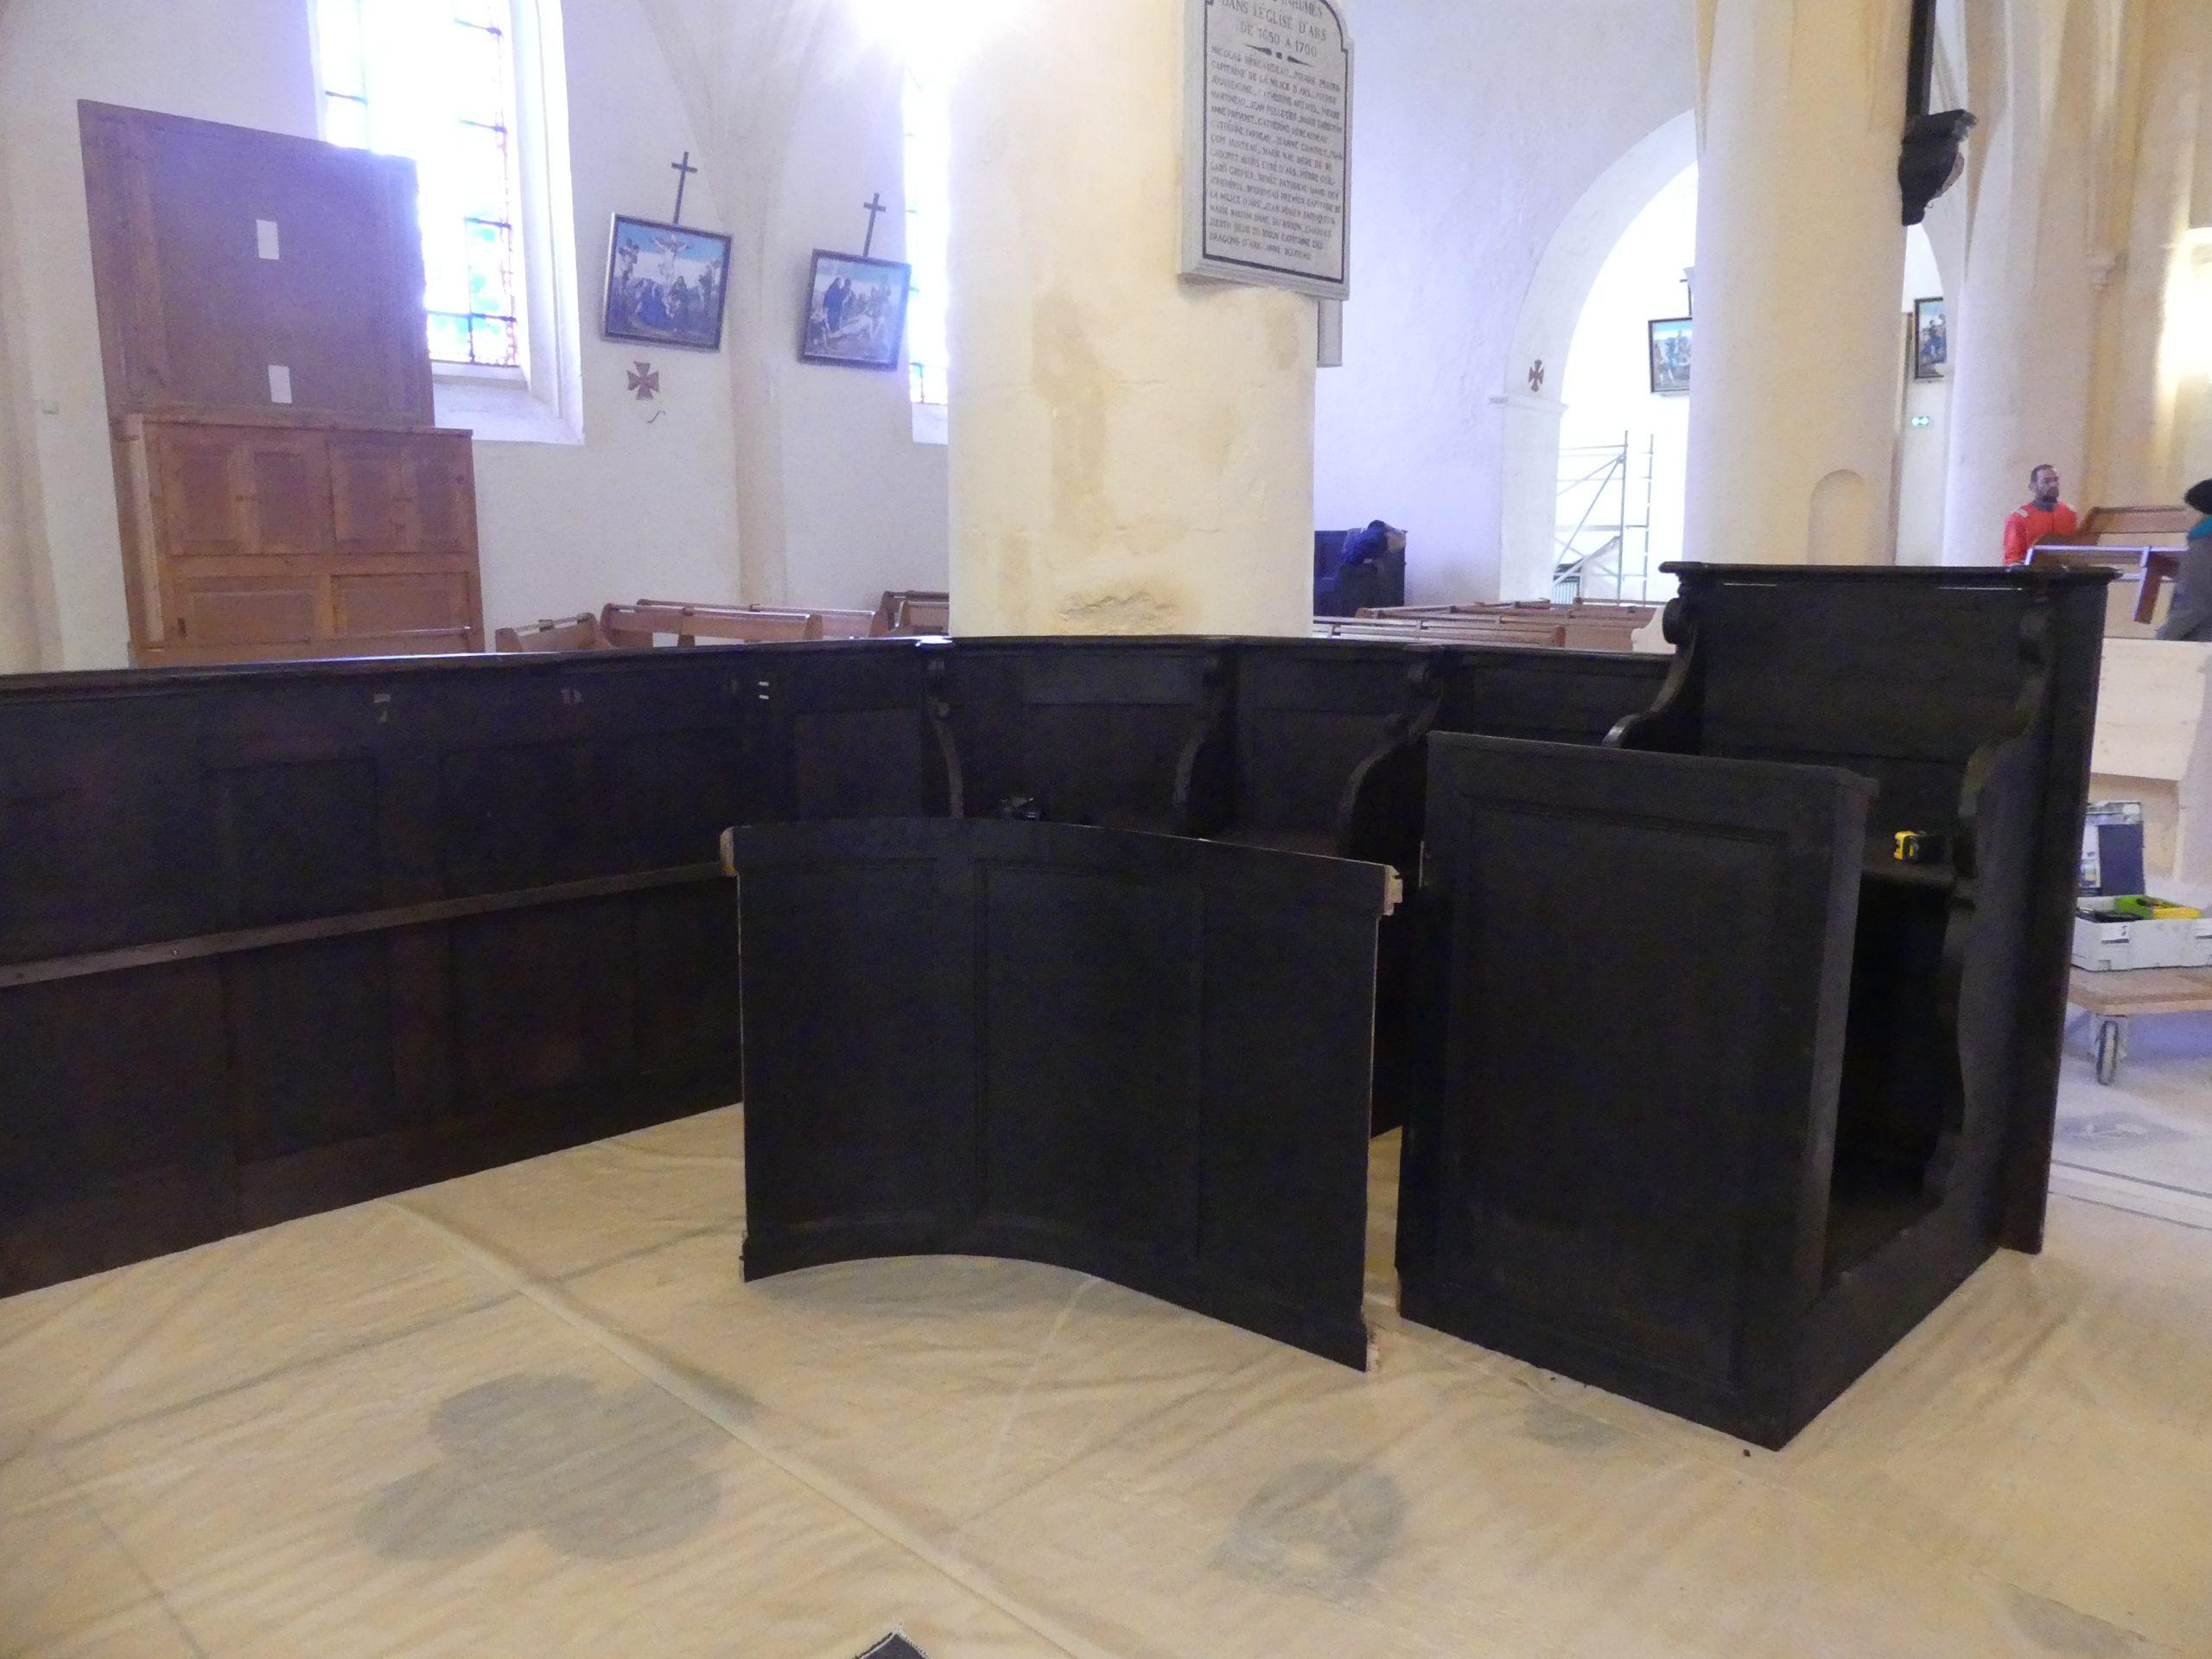 Ars - Eglise - Stales rénovées - 12 mars 2020